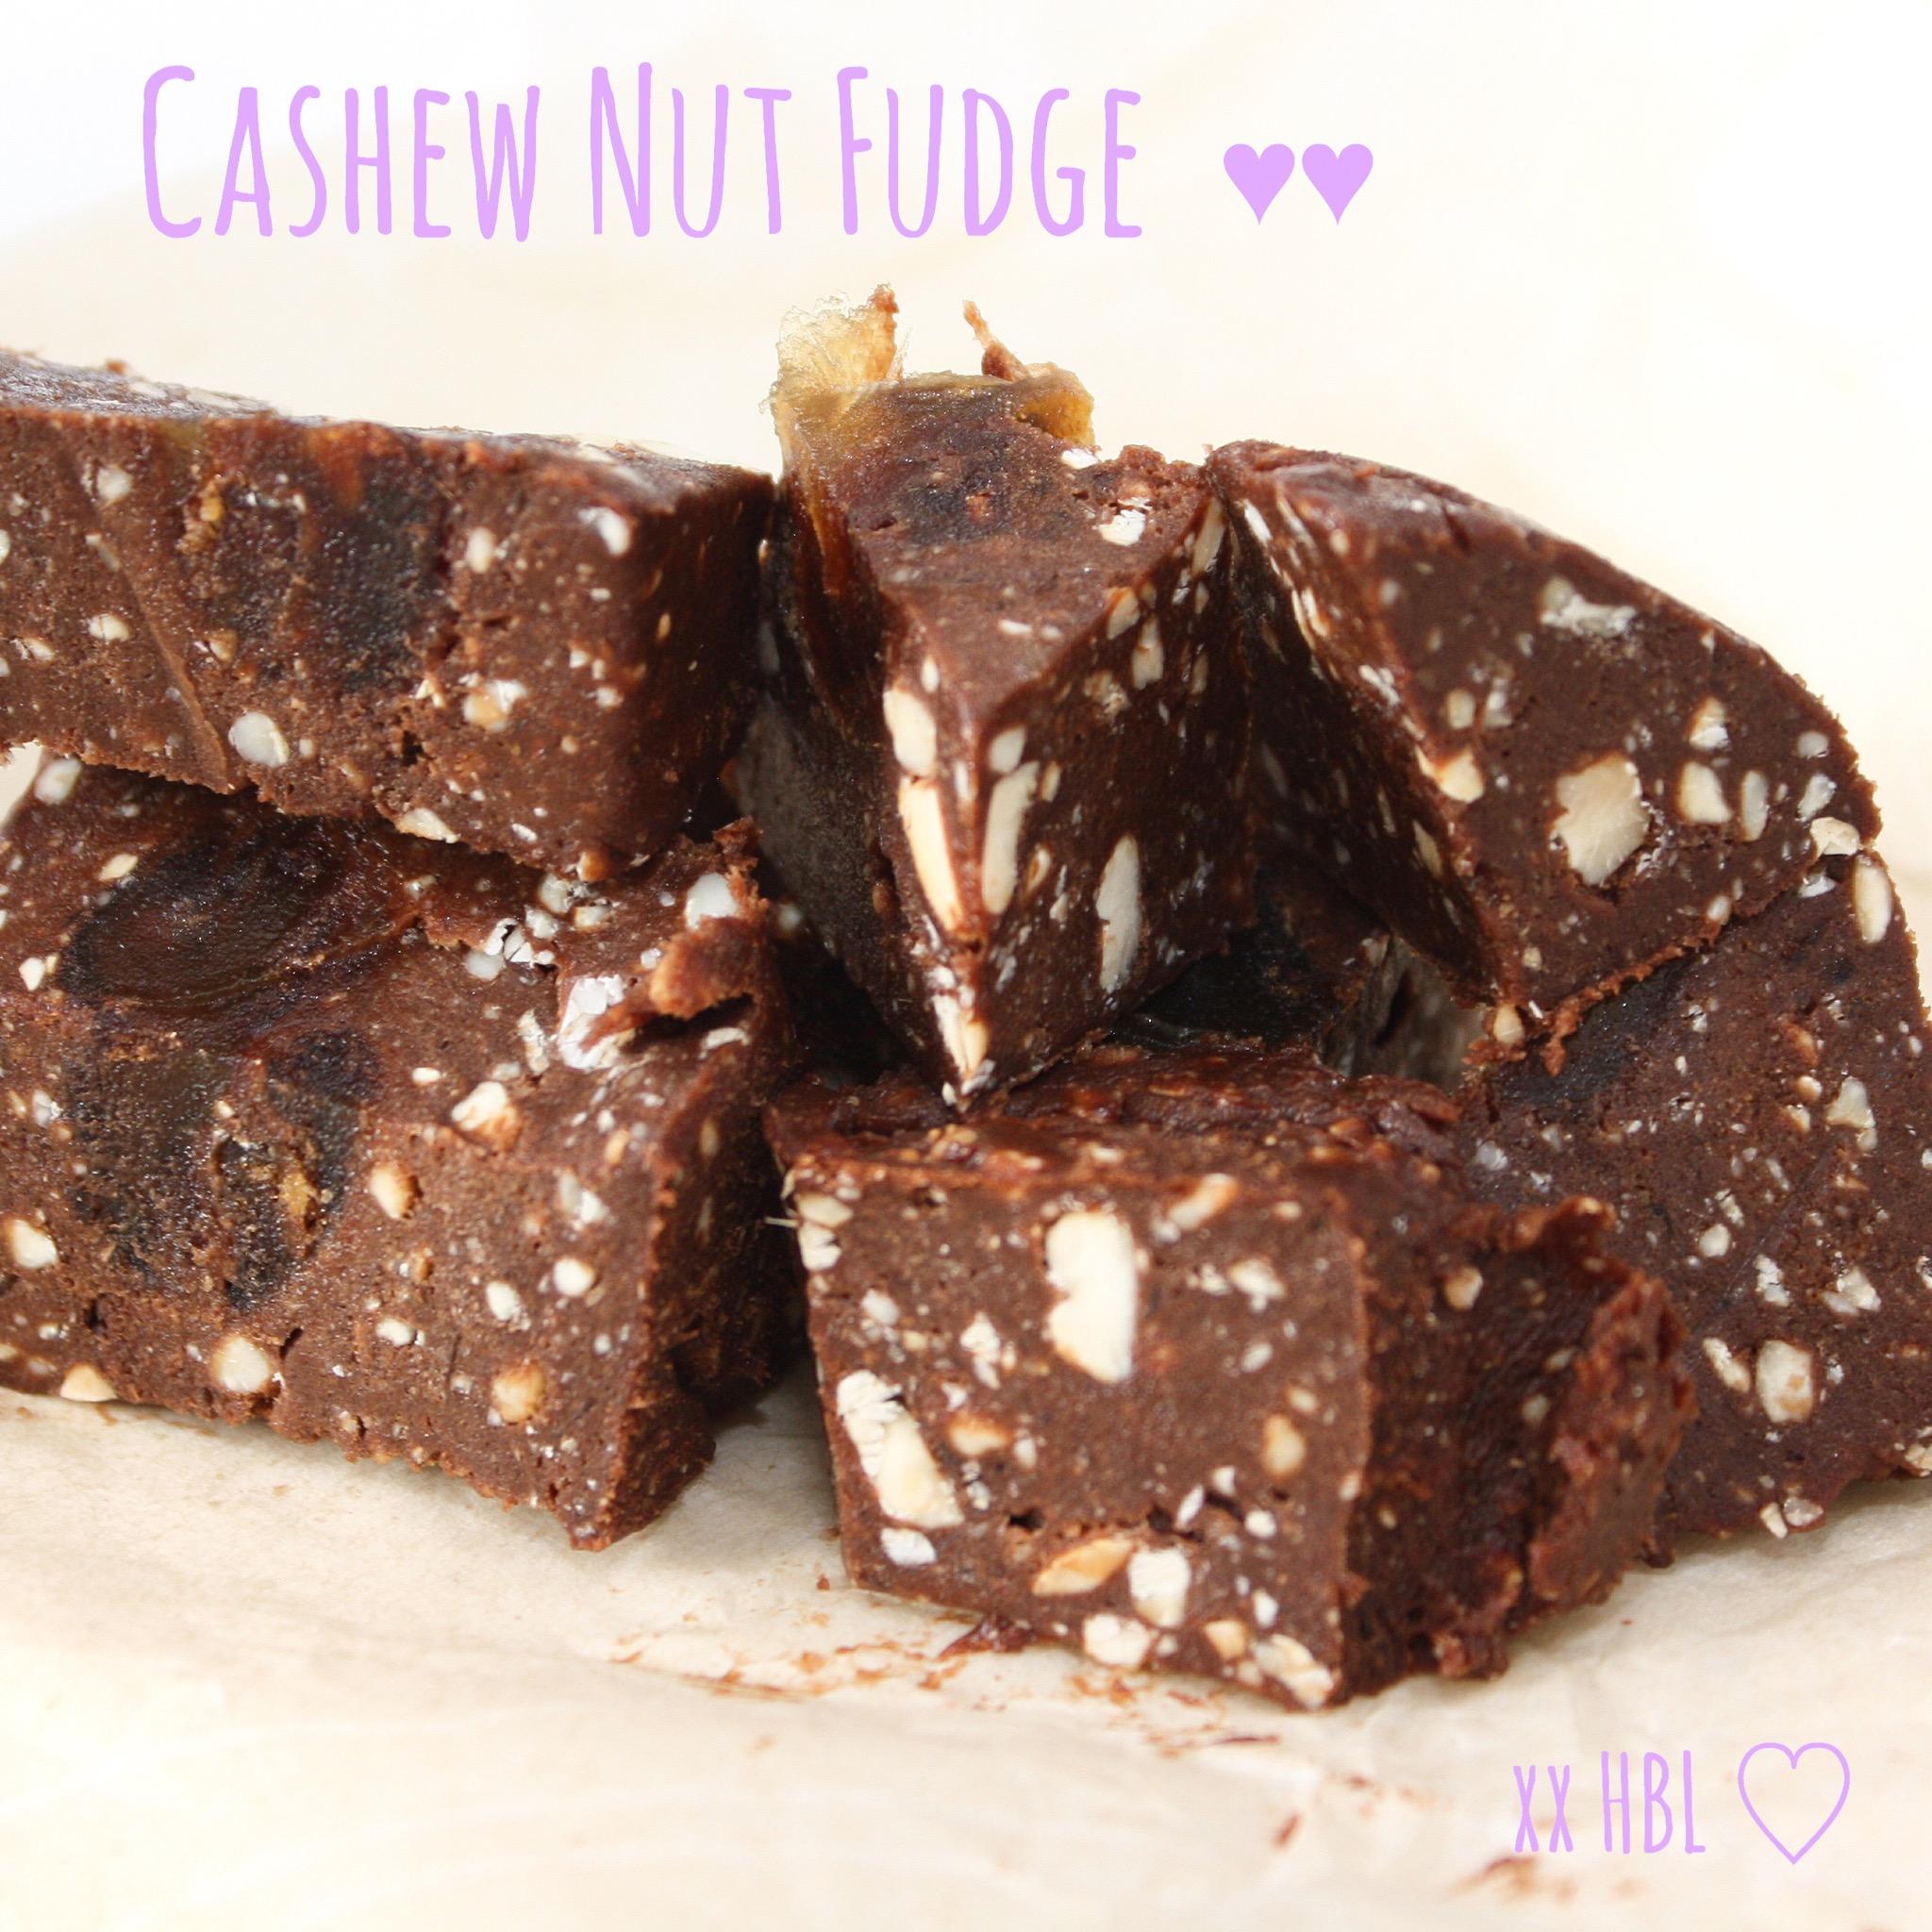 Cashew Nut Fudge